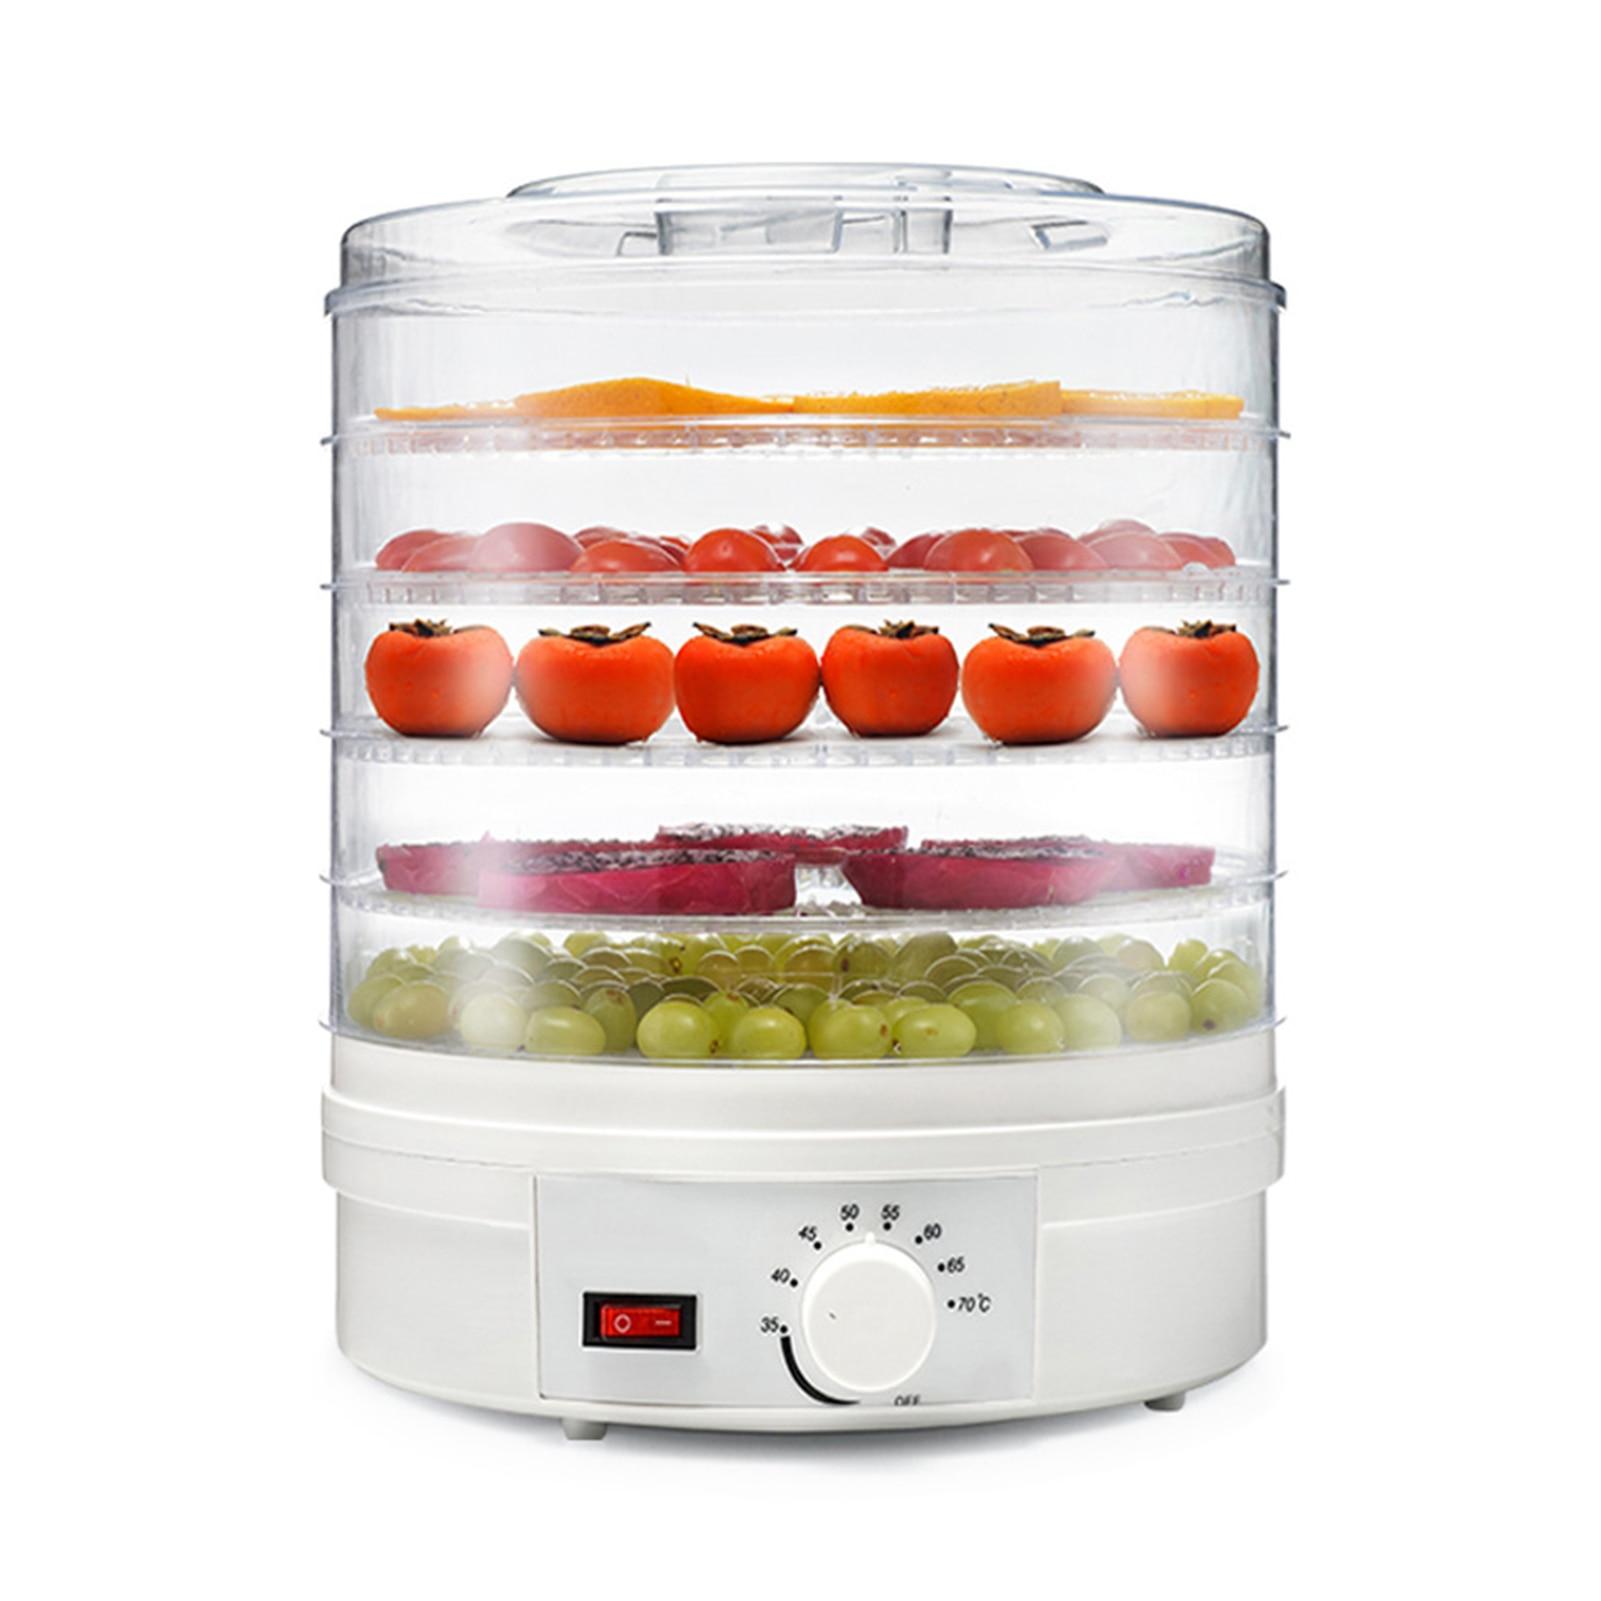 Fruit Dryer Professional Electric Food Dehydrator 280W 5 Tray Beef Fruit Vegetable Dryer Beef Jerky Machine